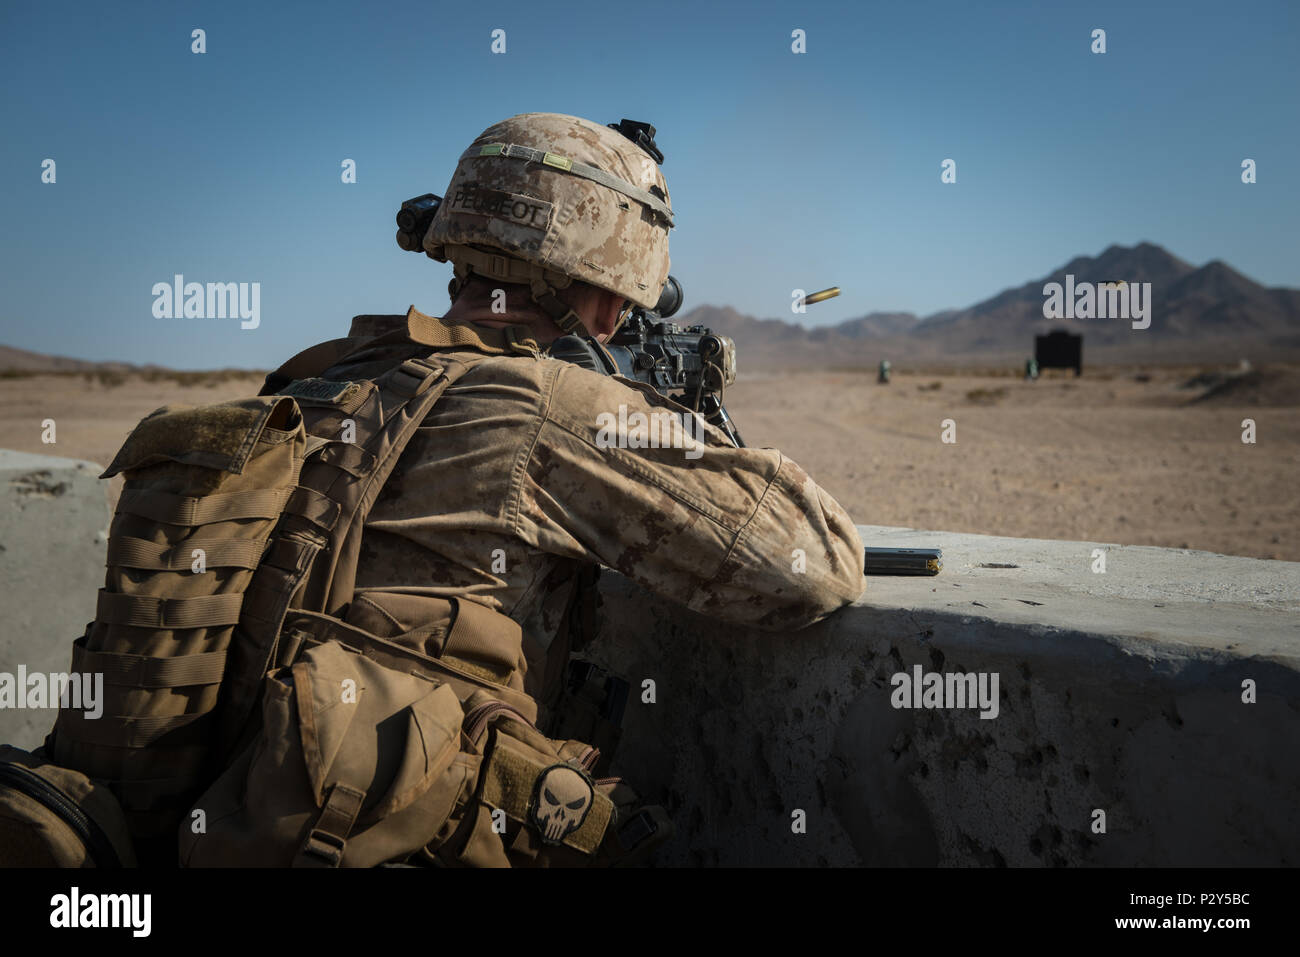 A Marine With Kilo Company 3rd Battalion 5th Marine Regiment